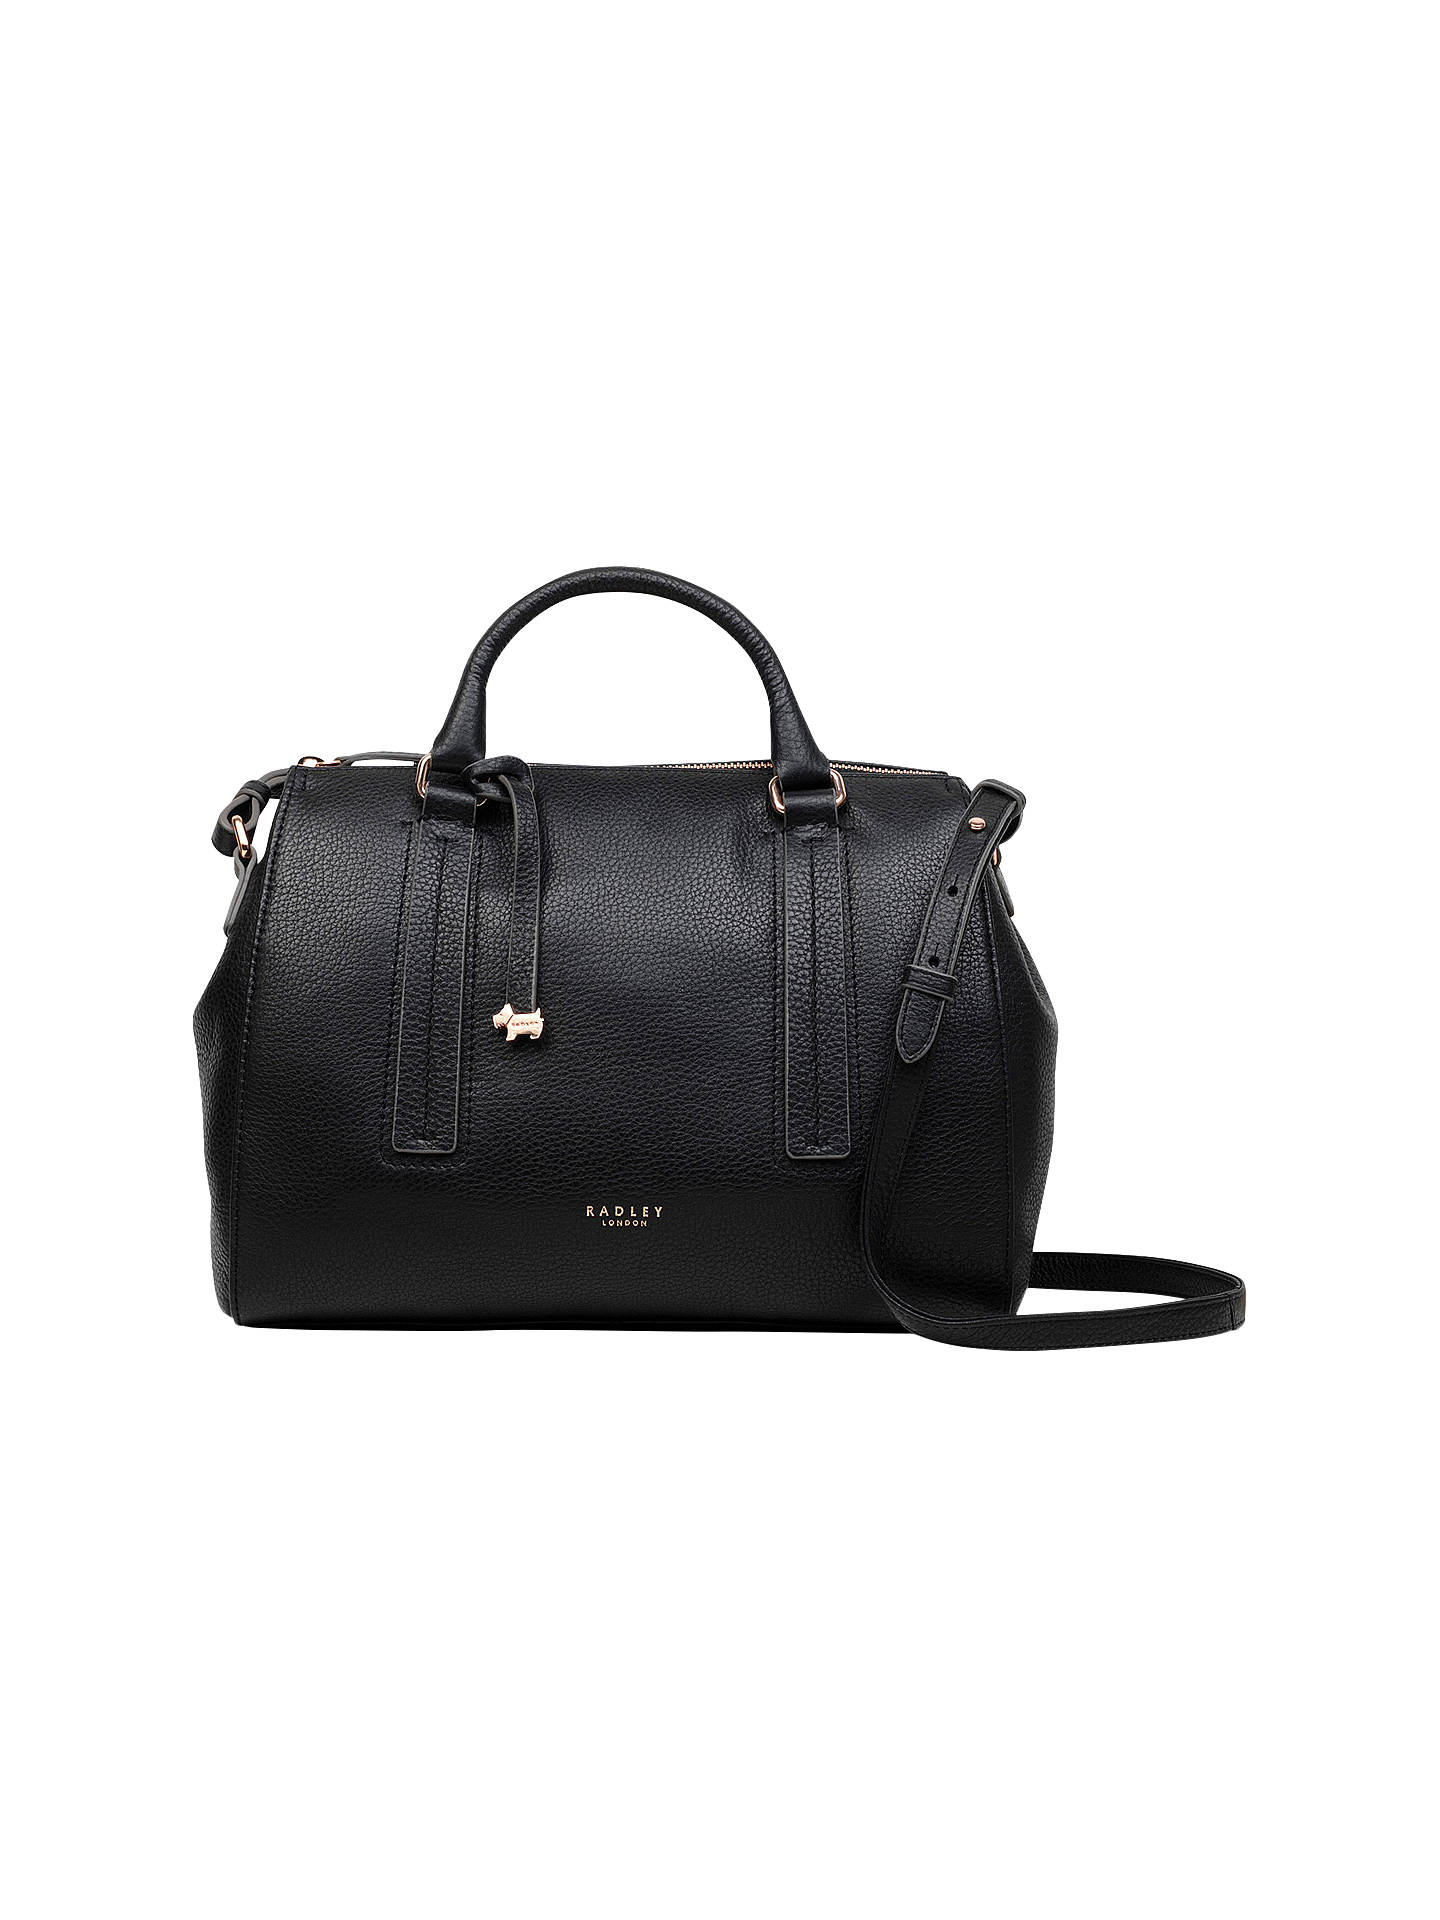 Radley Globe Road Leather Medium Grab Bag Black Online At Johnlewis